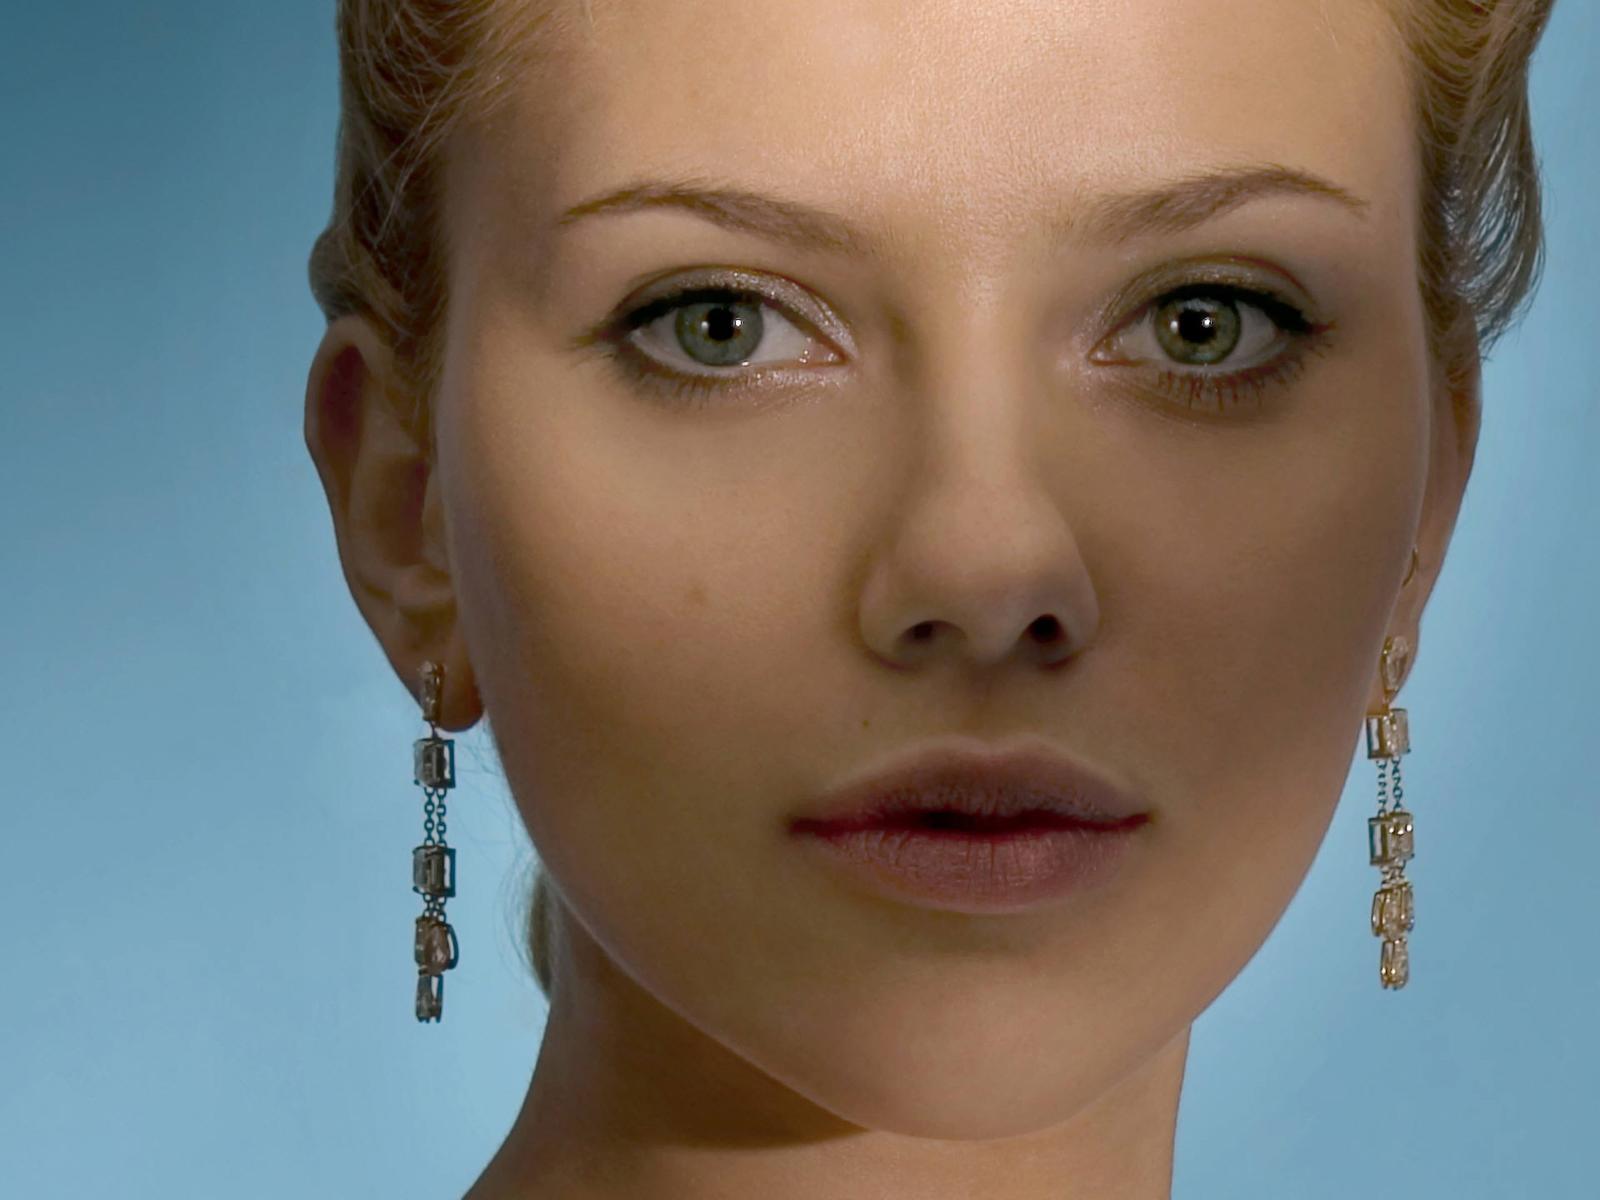 http://4.bp.blogspot.com/-ldoQ5UMfE3s/Tr1H2ieaktI/AAAAAAAAJEk/ArBV8UhbFX4/s1600/Scarlett_Johansson_Wallpapers_TALKING_EYE.jpg